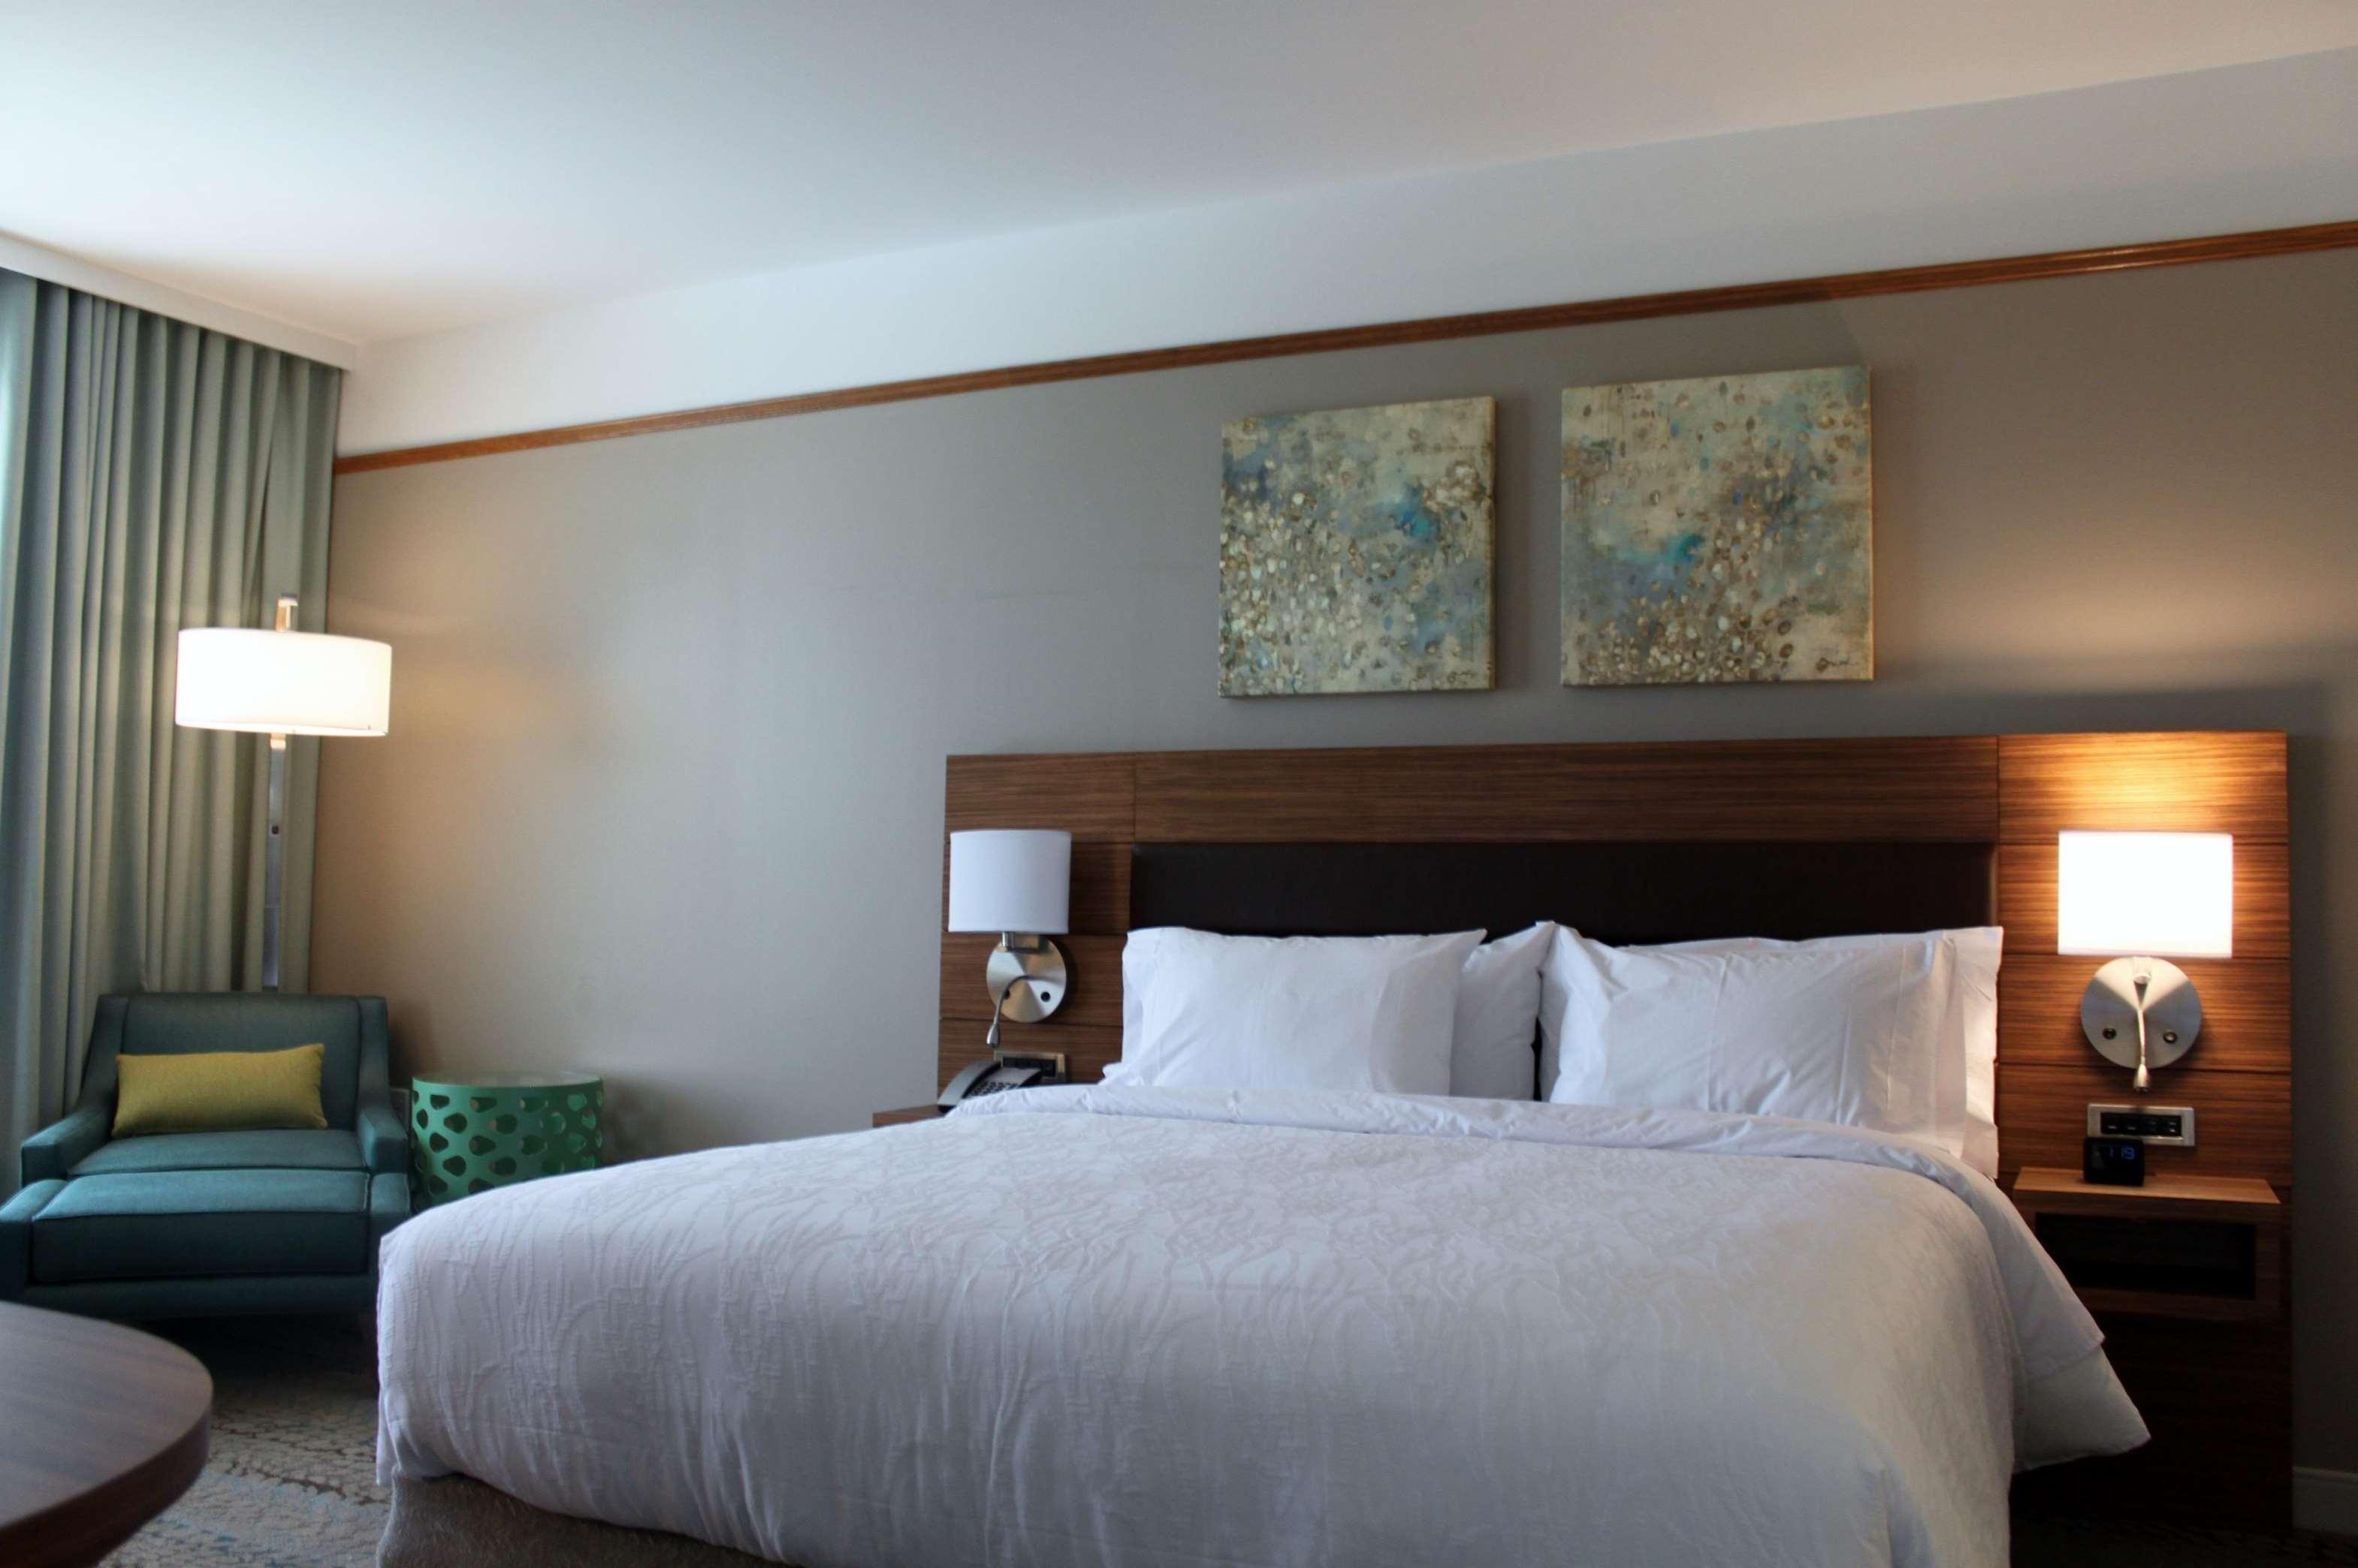 Hilton Garden Inn Boston/Marlborough image 19